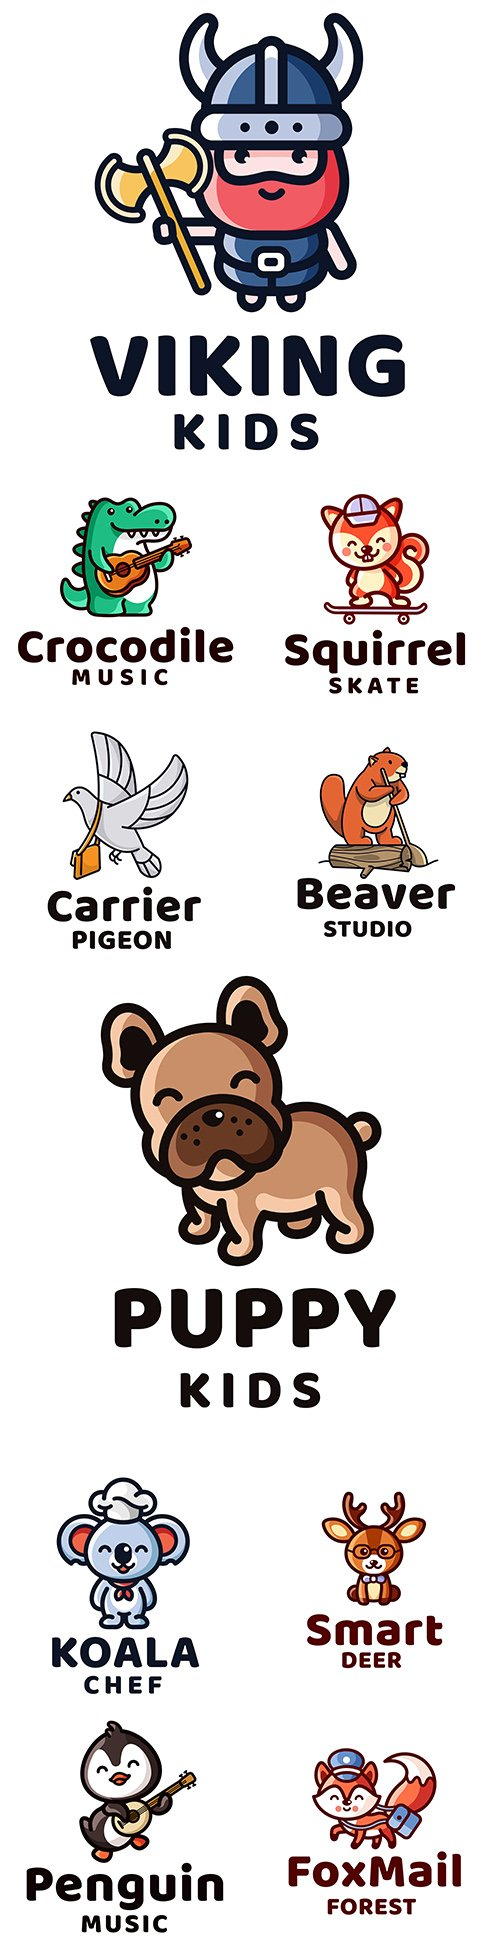 Animal linear design logo company template 42